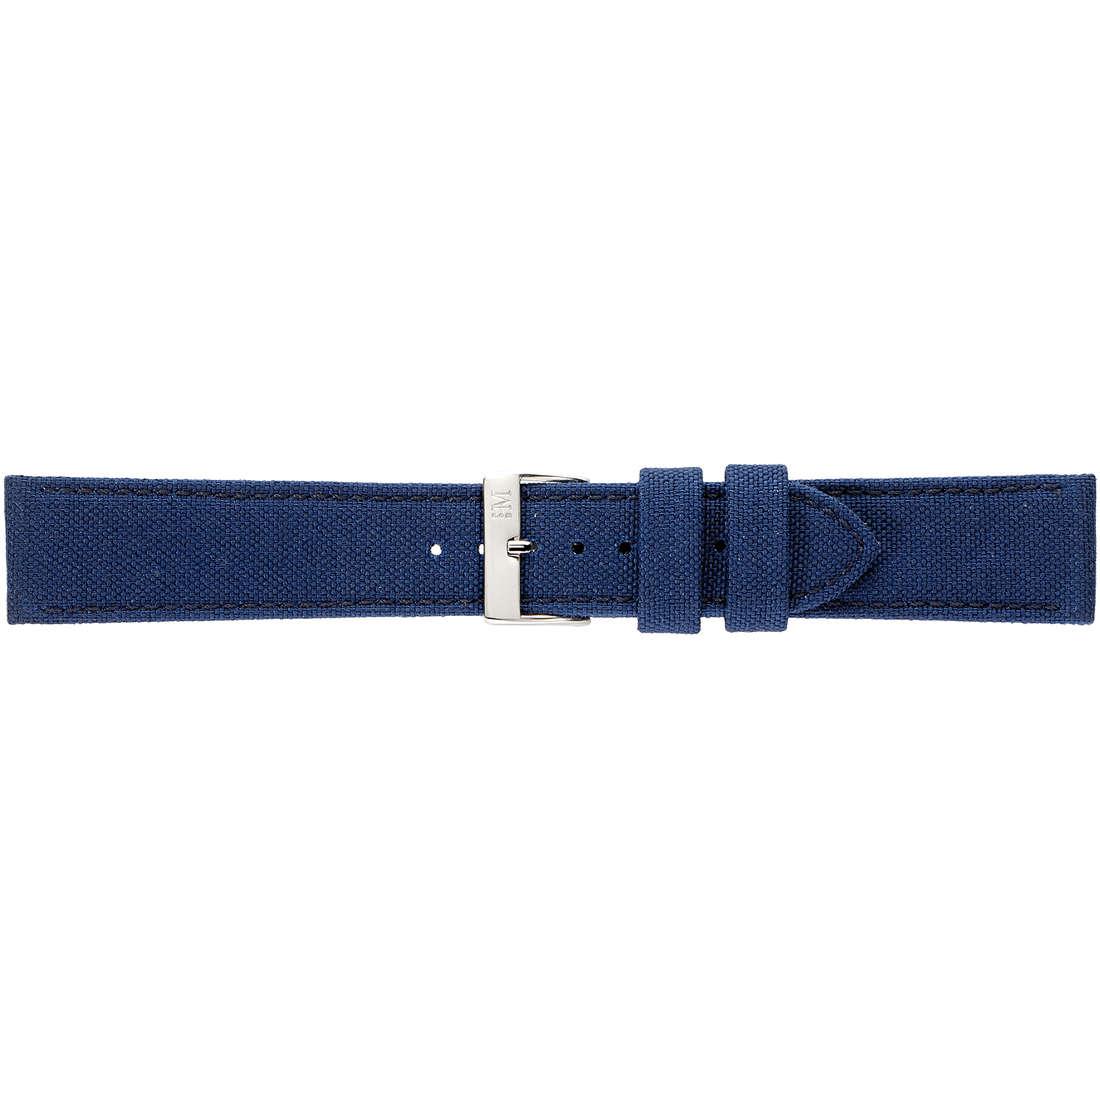 watch watch bands watch straps man Morellato Linea Sport A01U2779110061CR22